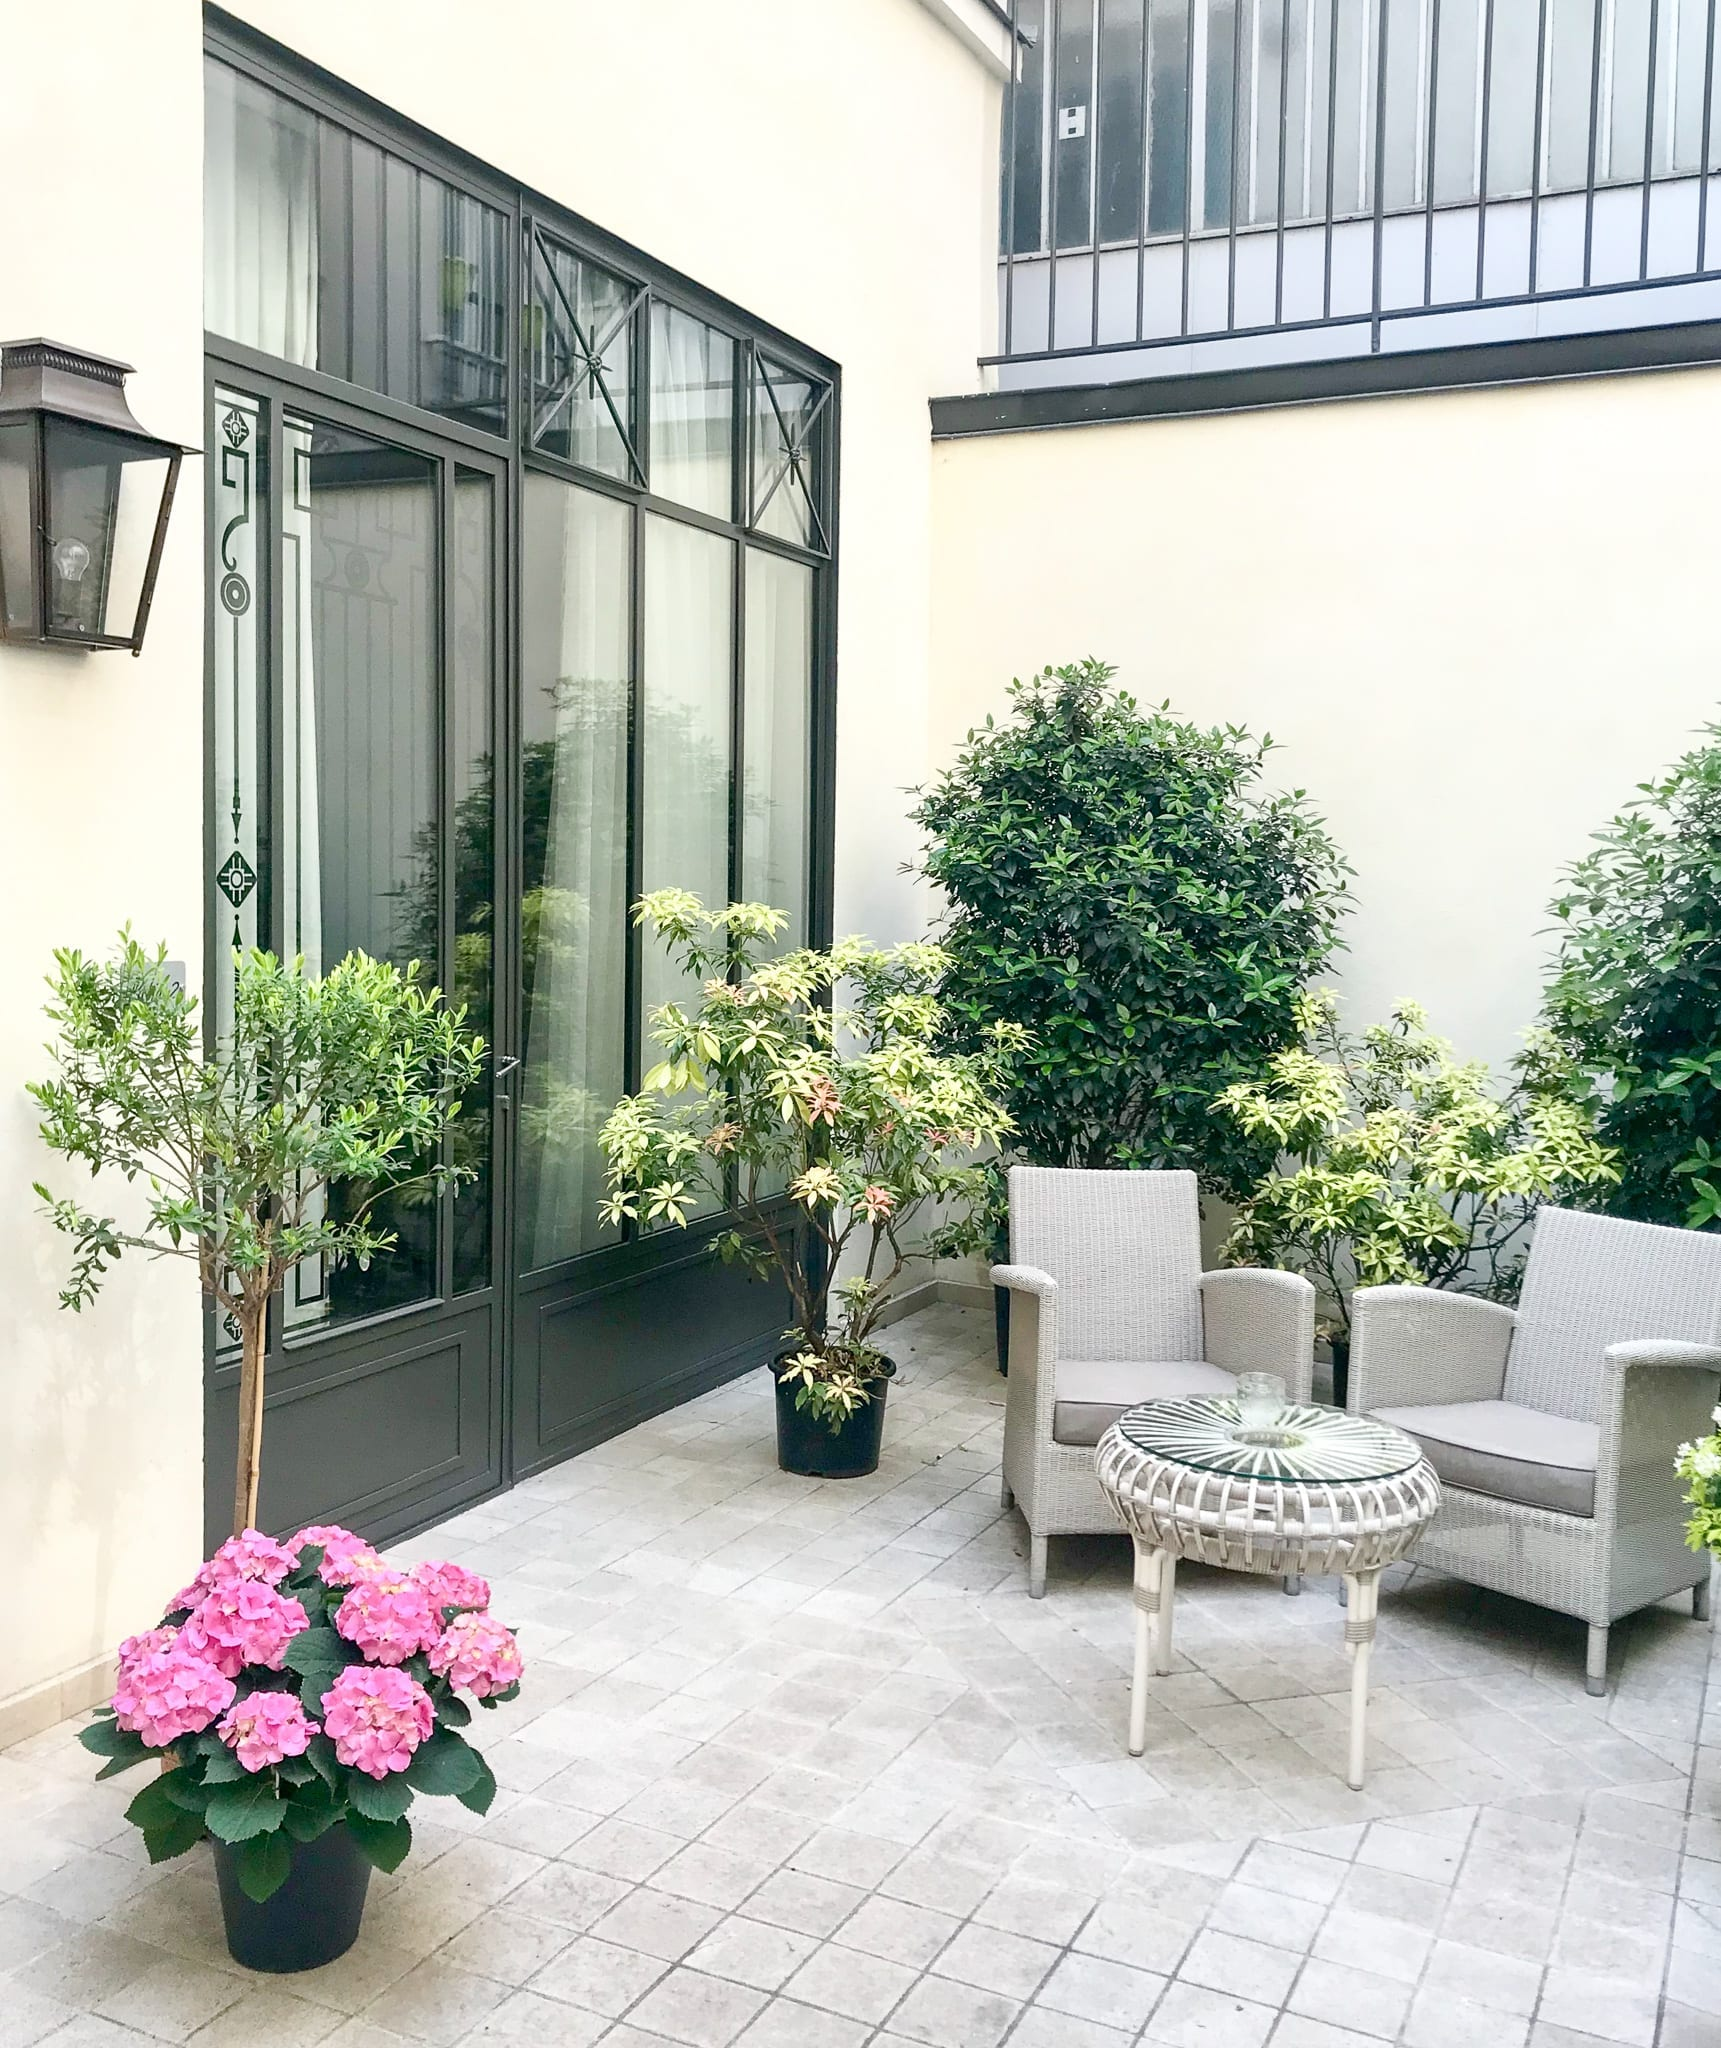 4 days in Paris - My home in Paris hotel